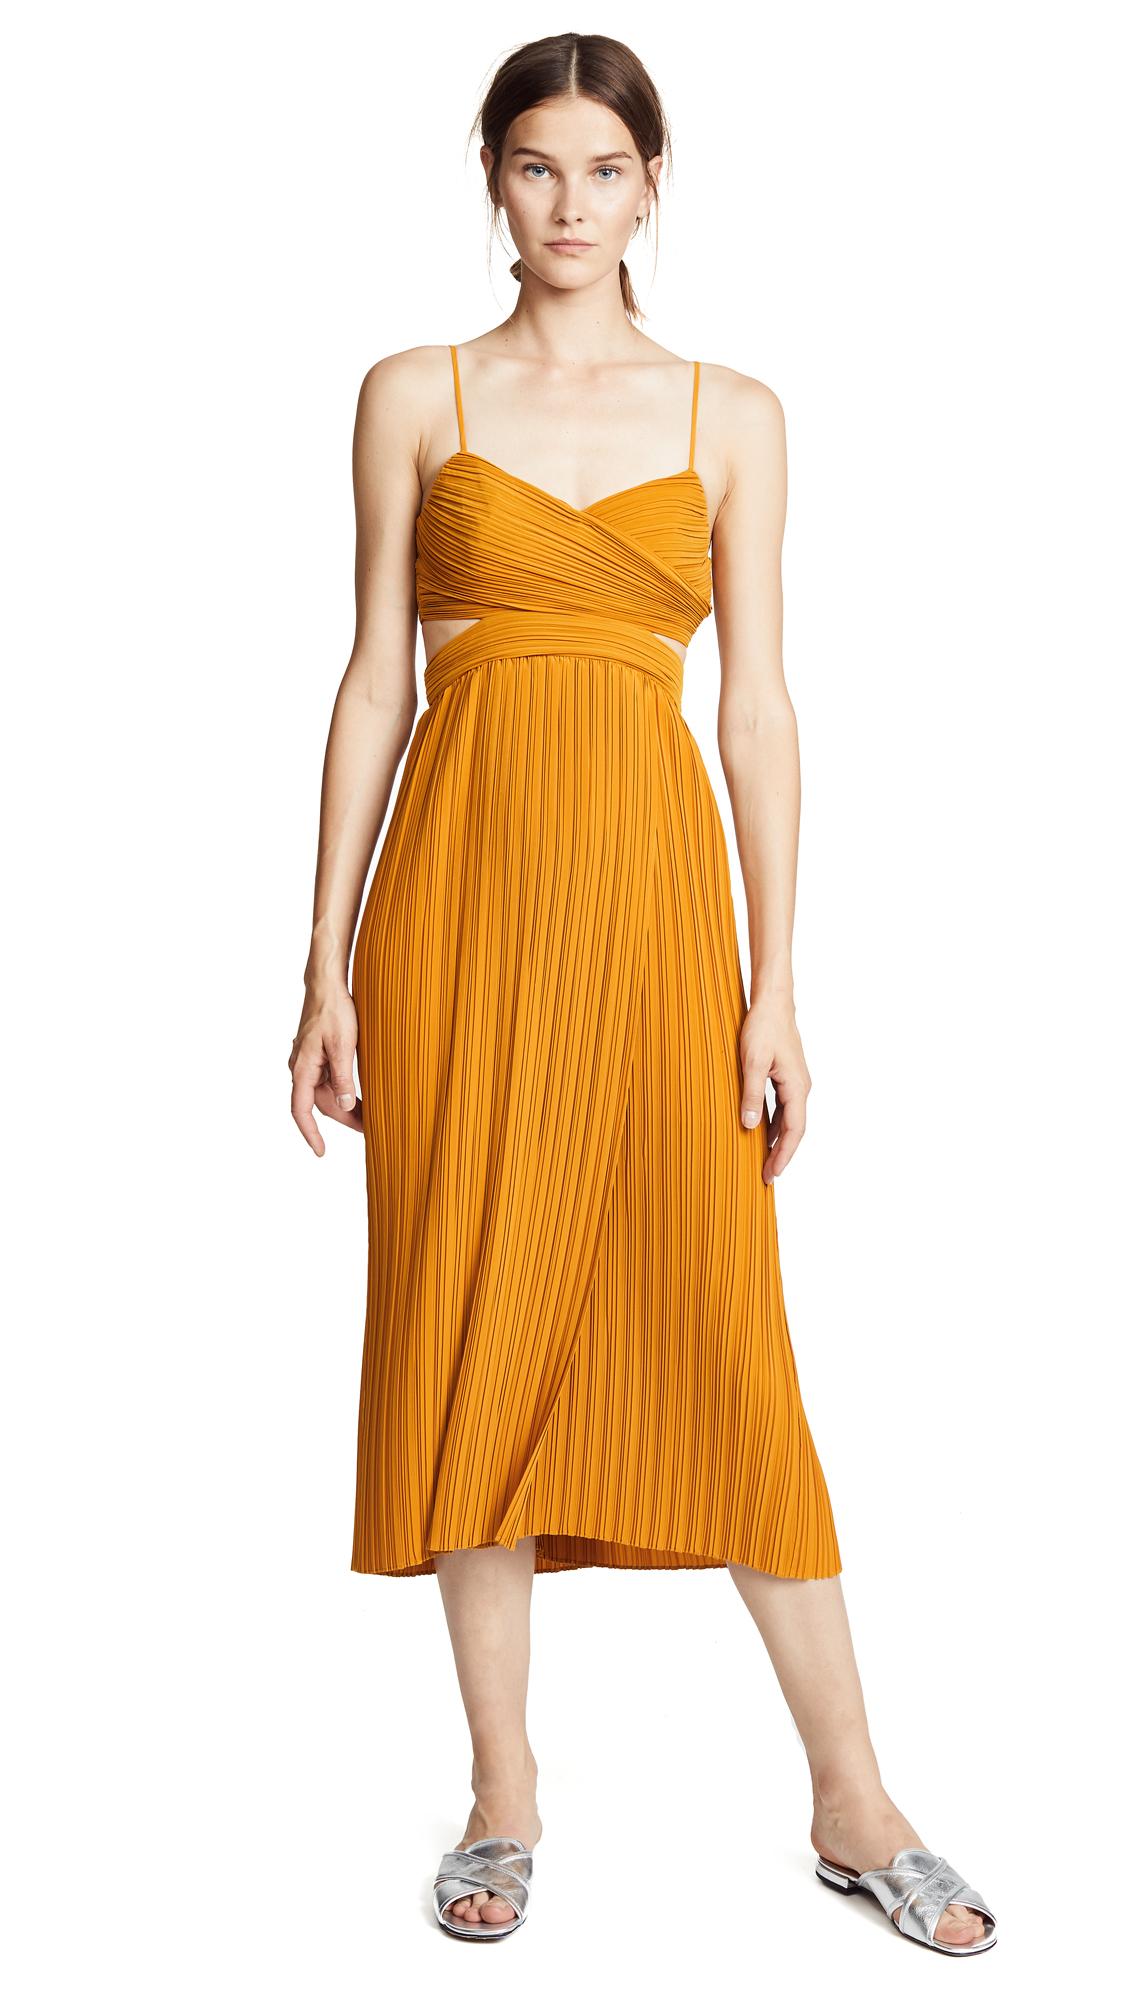 A.L.C. Sienna Dress In Marigold